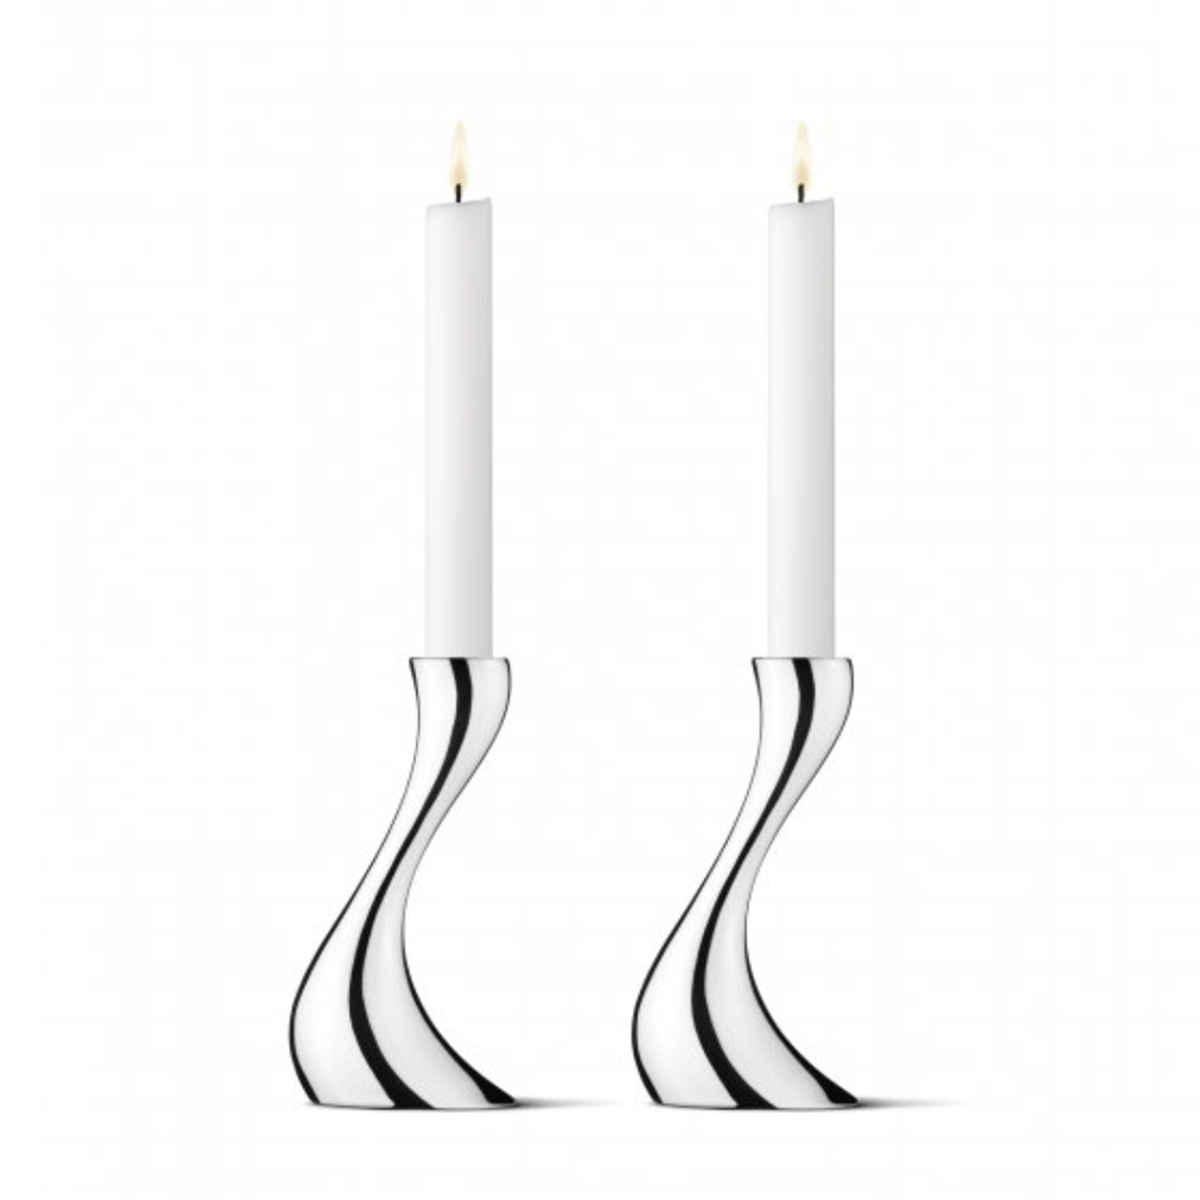 Georg Jensen Cobra Candle Holders Set of 2